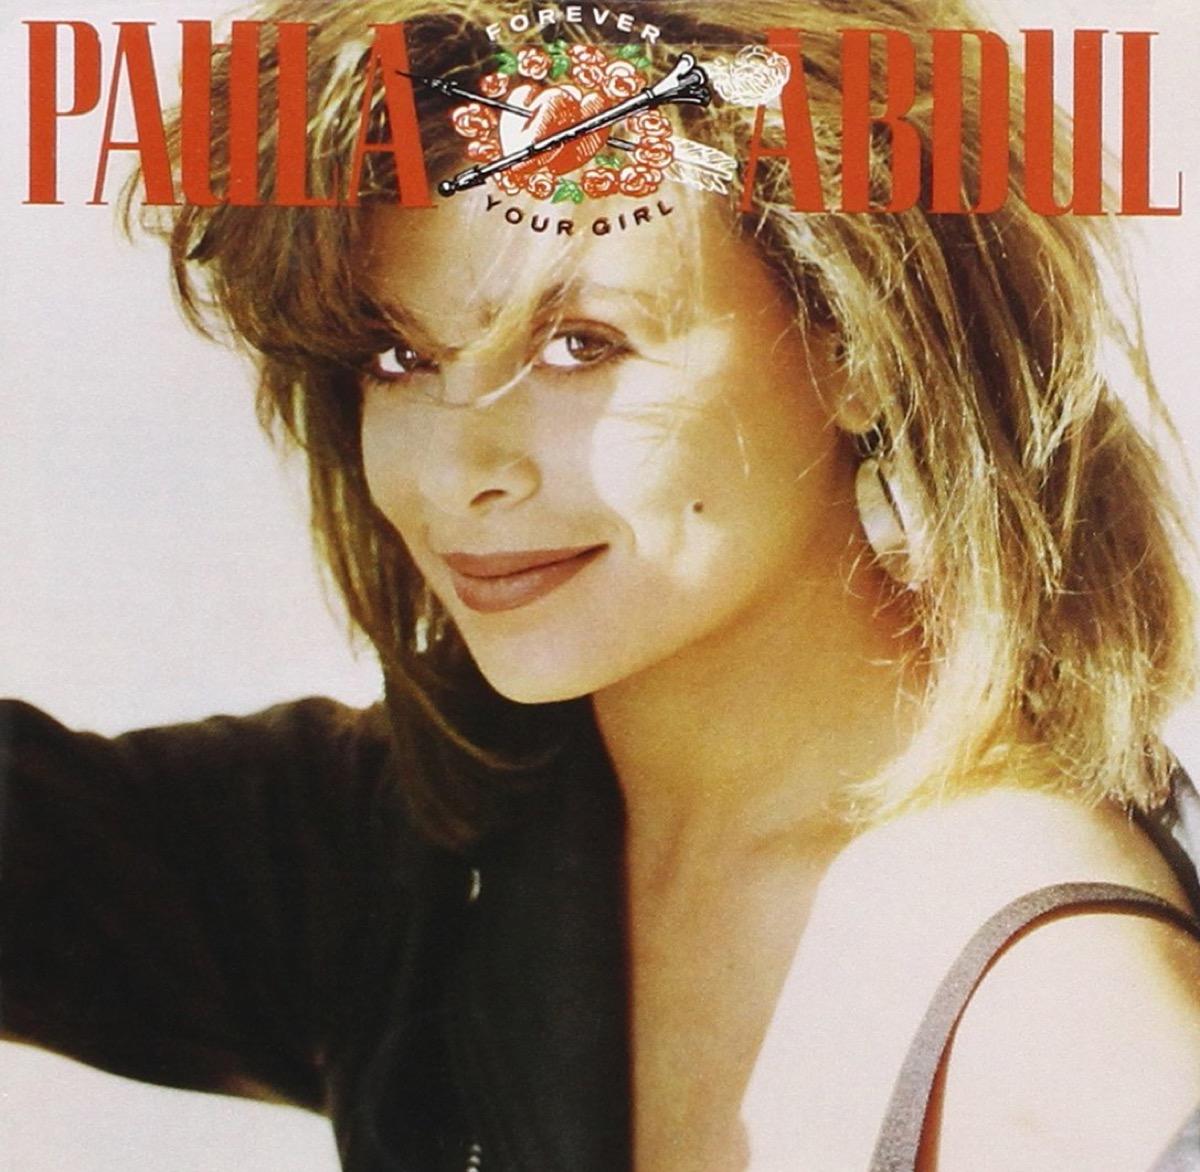 "Paula Abdul ""Forever Your Girl"" album cover"